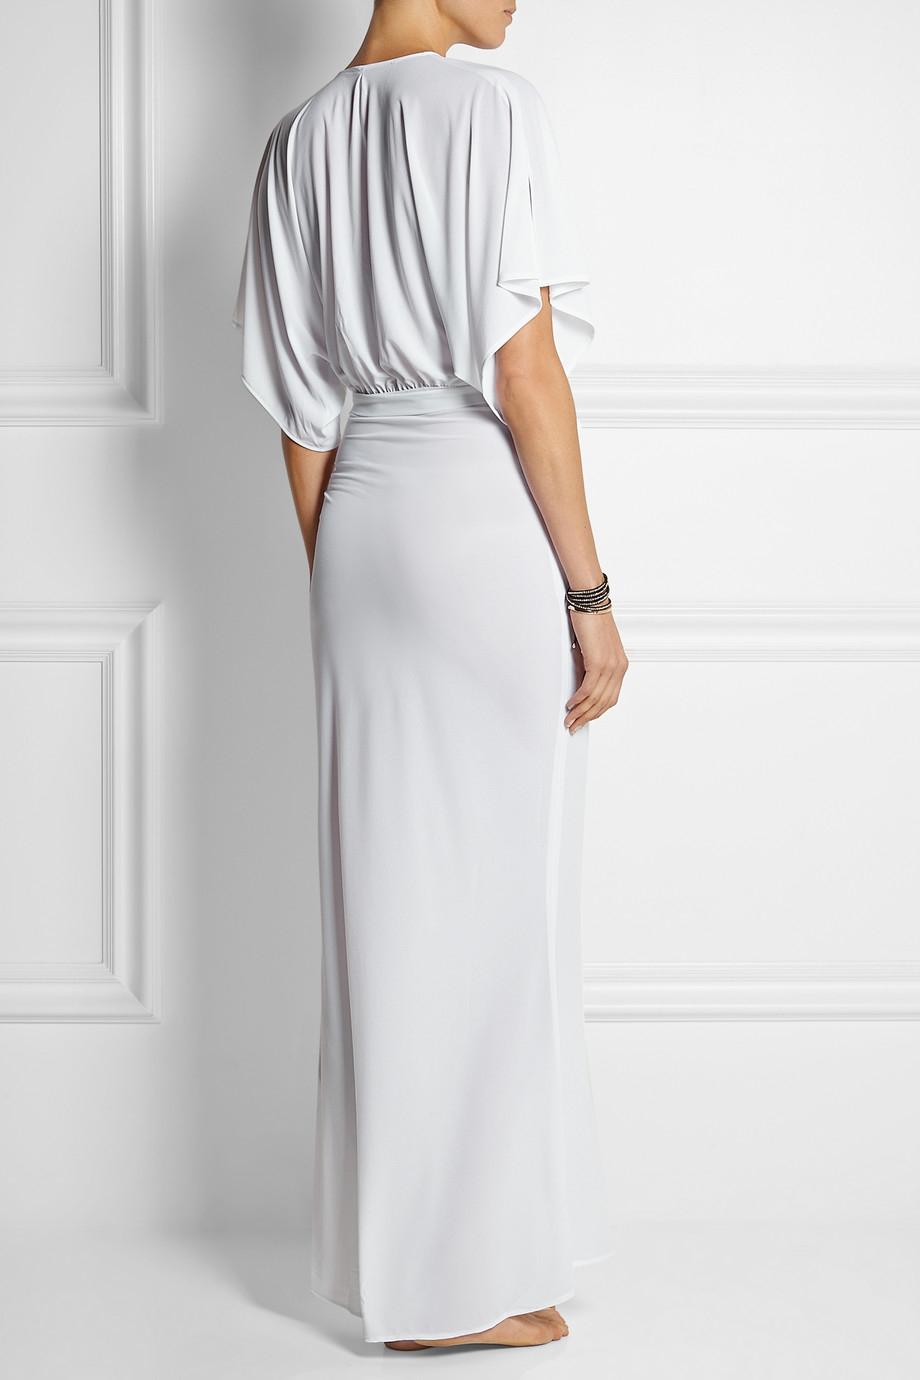 Norma Kamali Obie Stretch Jersey Maxi Dress In White Lyst